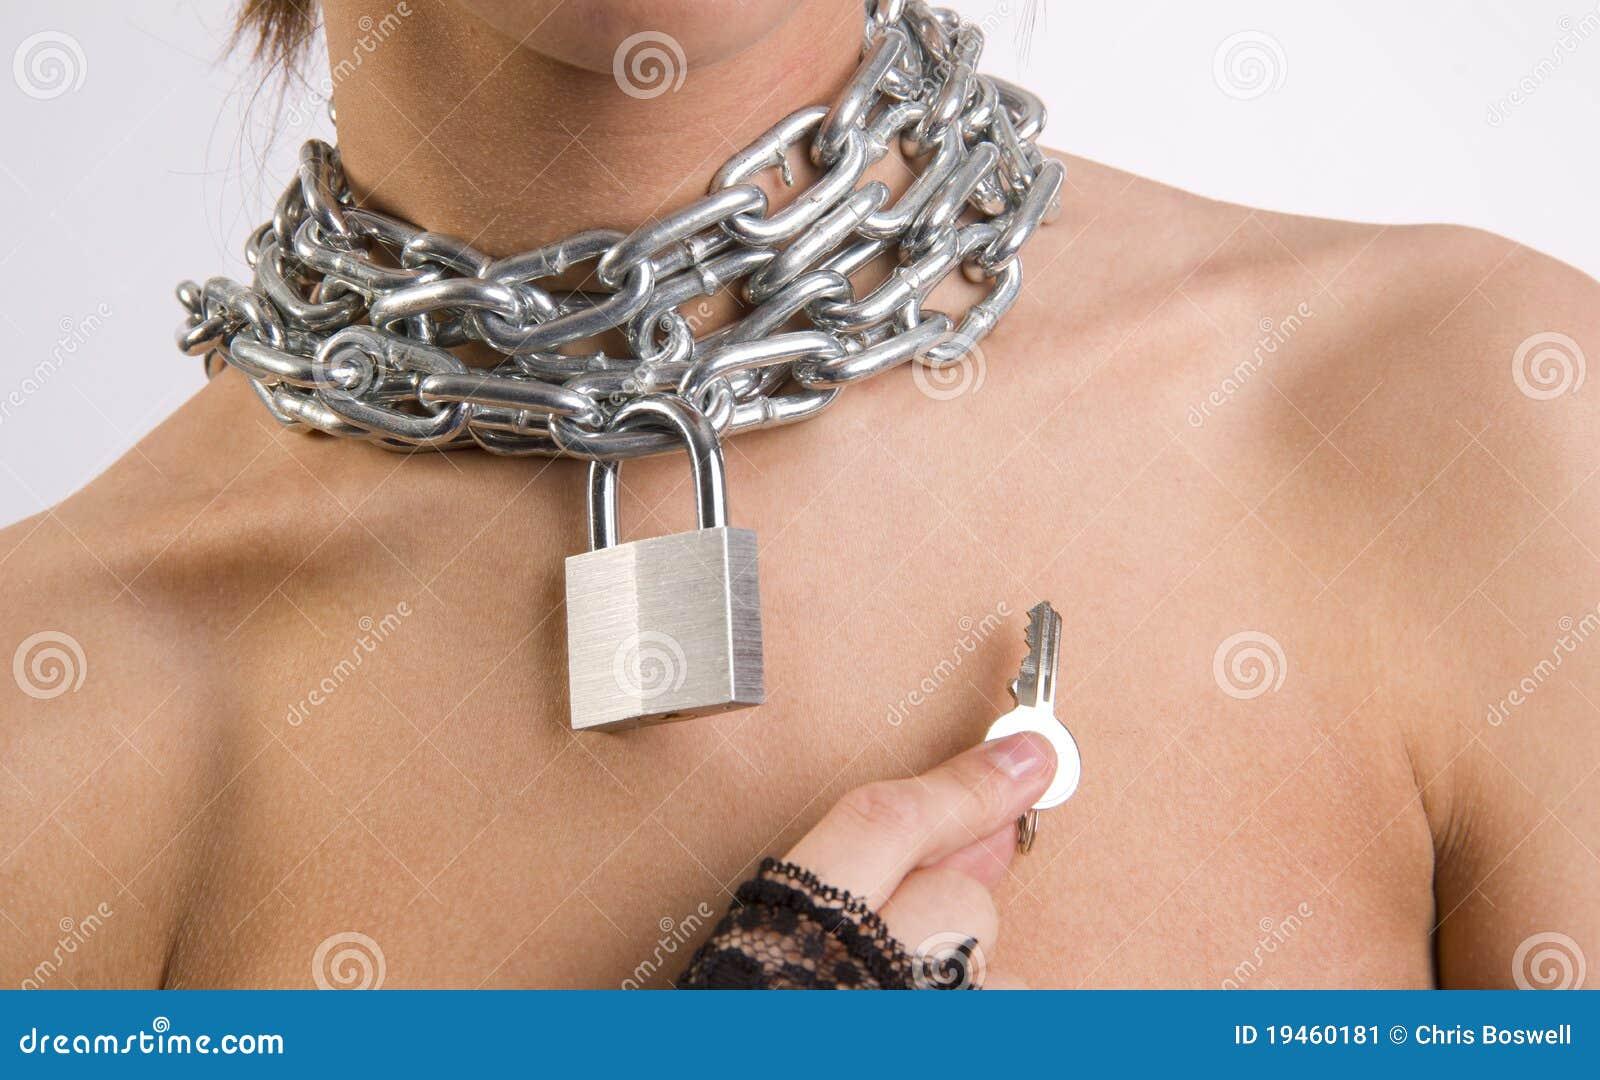 Dominance bondage anais nin